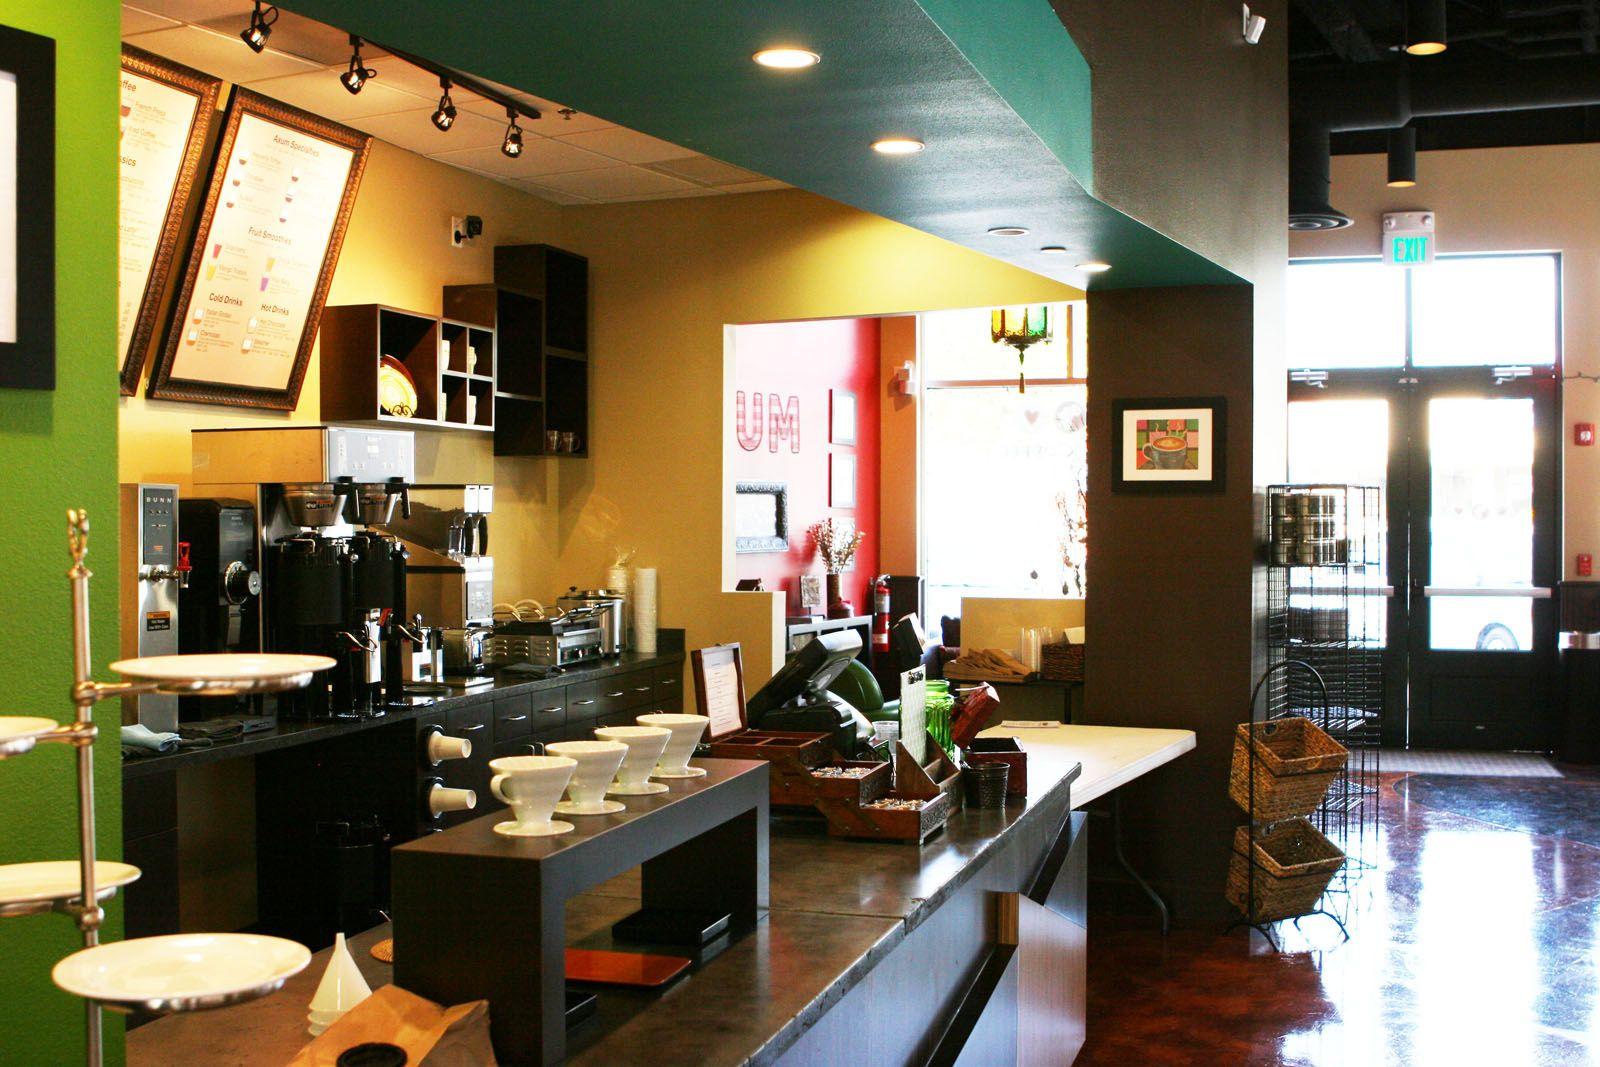 Counter Setup Wall Colors Flooring Option Twin Basket Rack Menu Frame Boards Coffee Shop Design Coffee Shops Interior Cafe Design